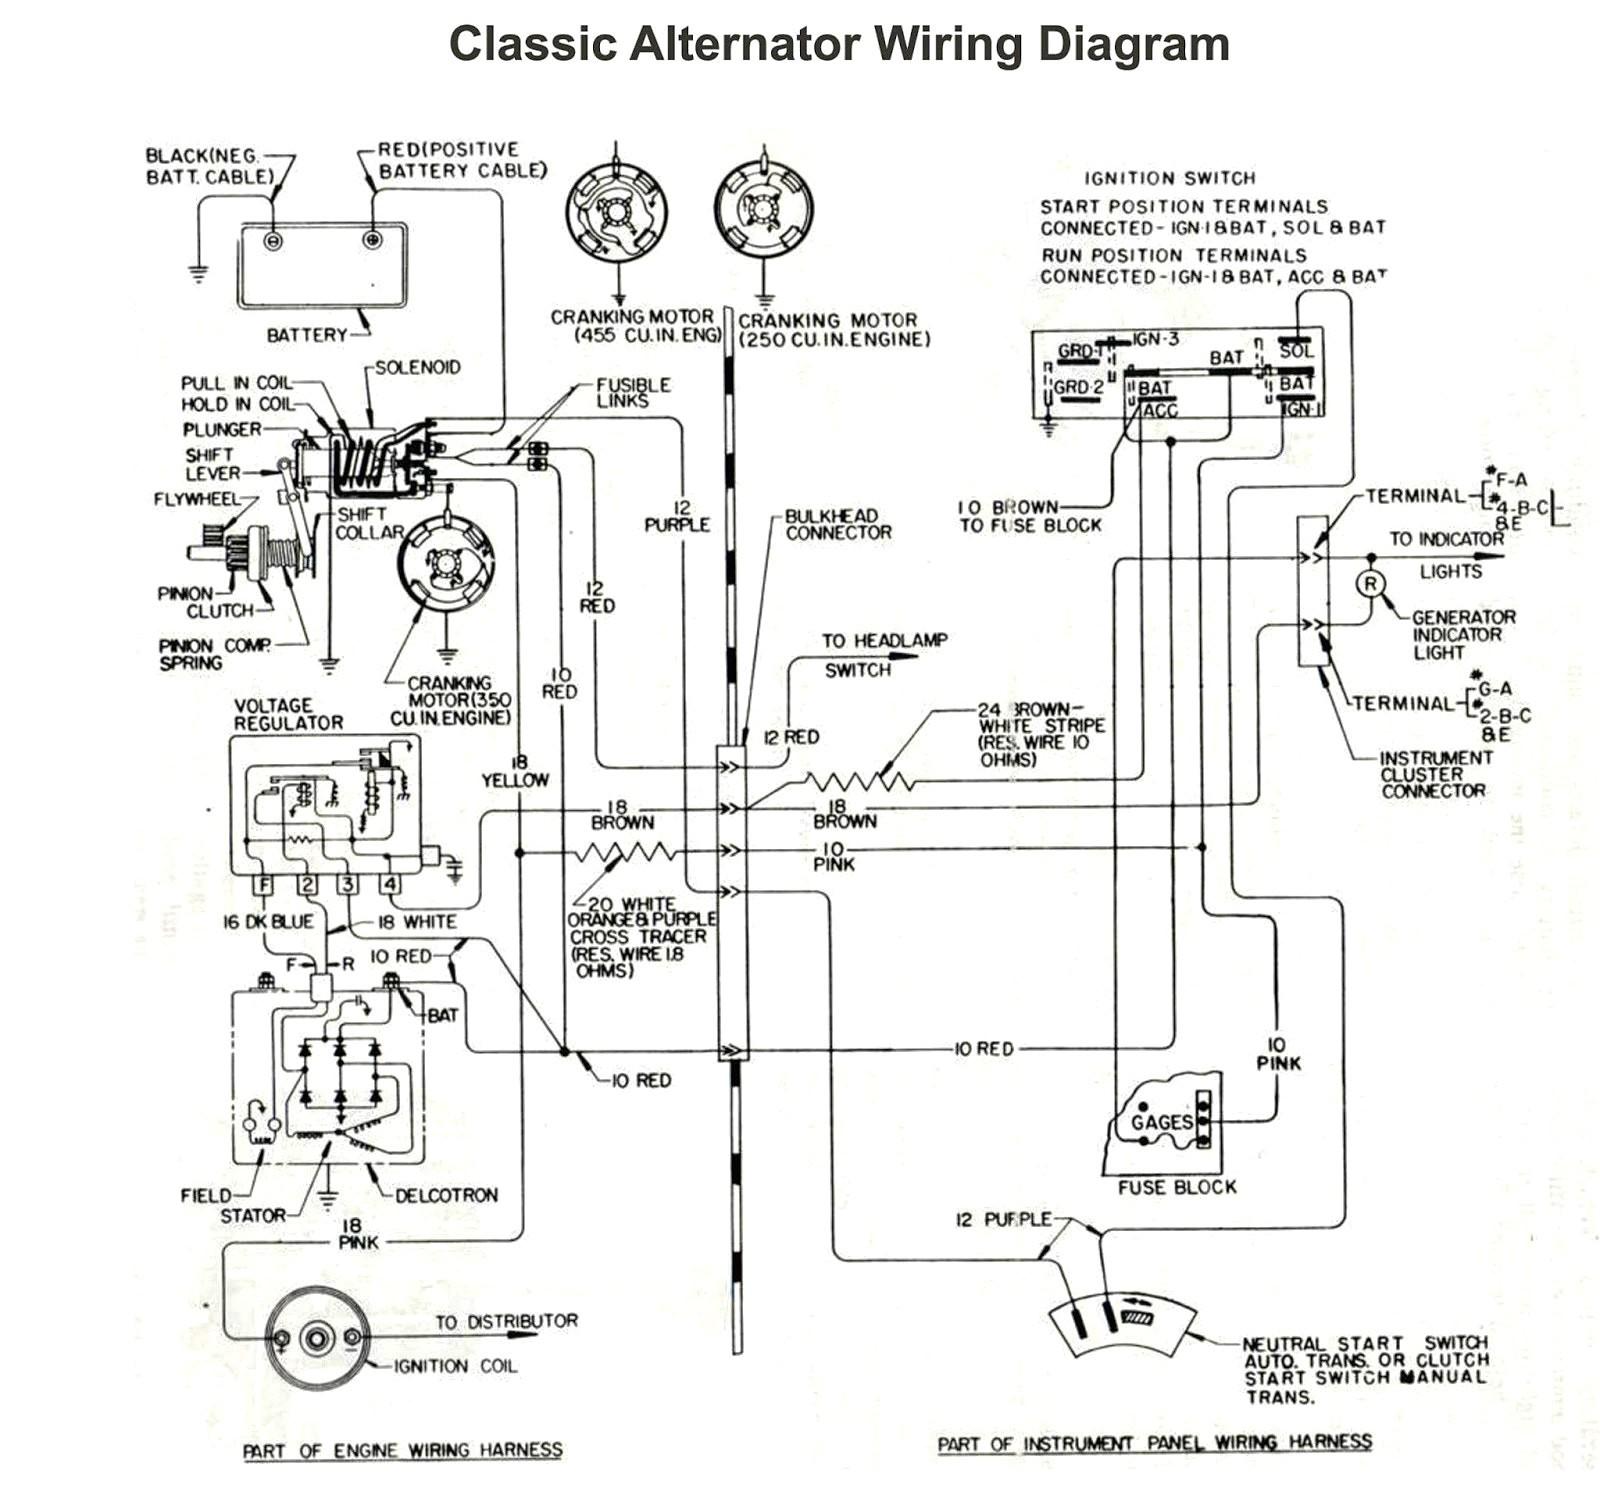 Elegant Cushman Truckster Wiring Diagram Image 36 Volt Arco Alternator Valid Modern For Illustration